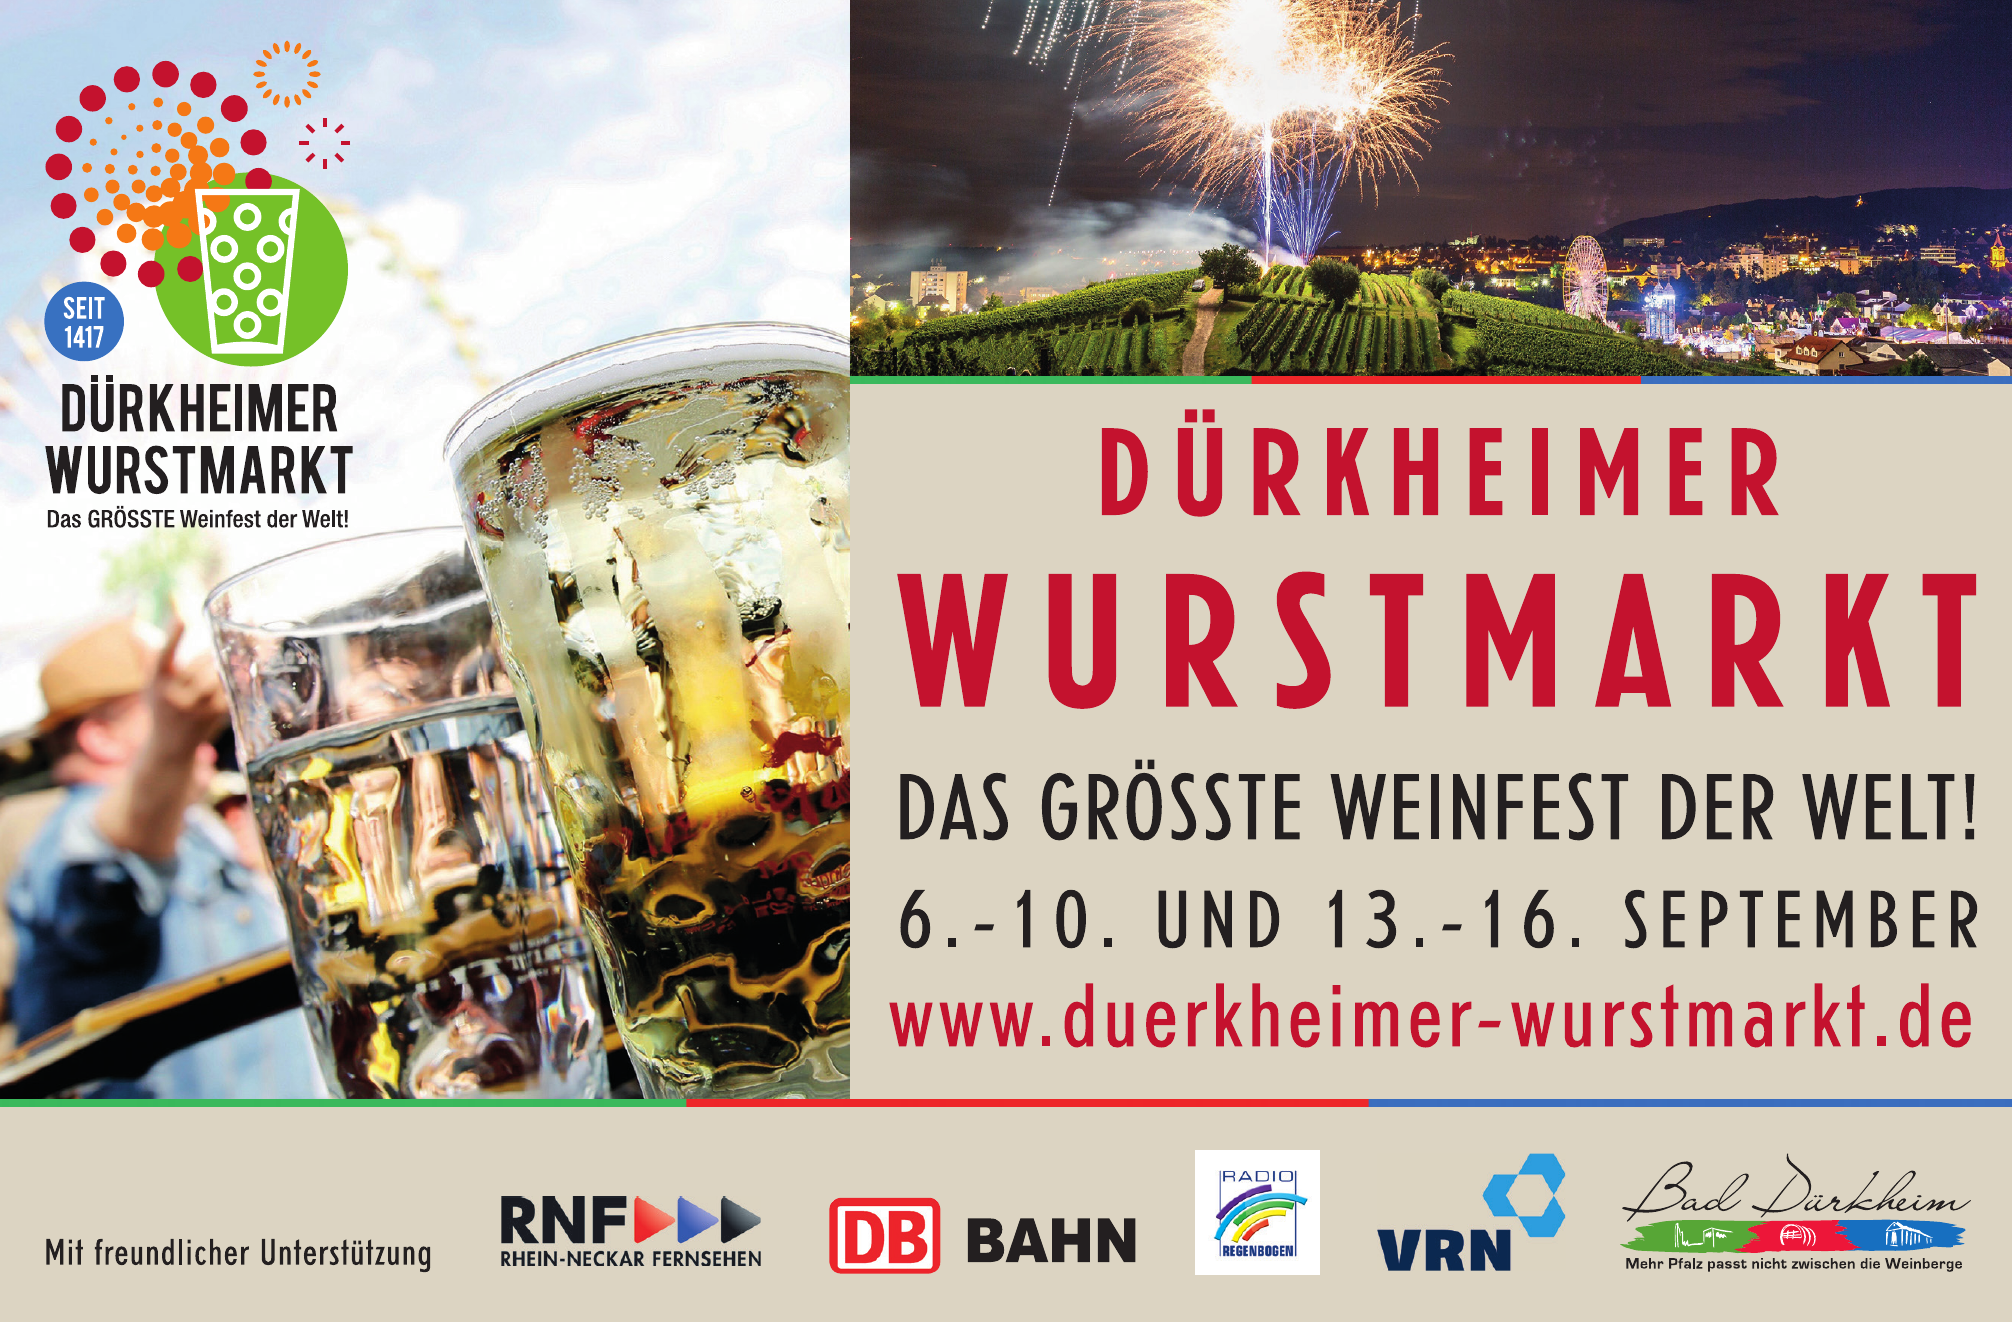 Dürkheimer Wurstmarkt